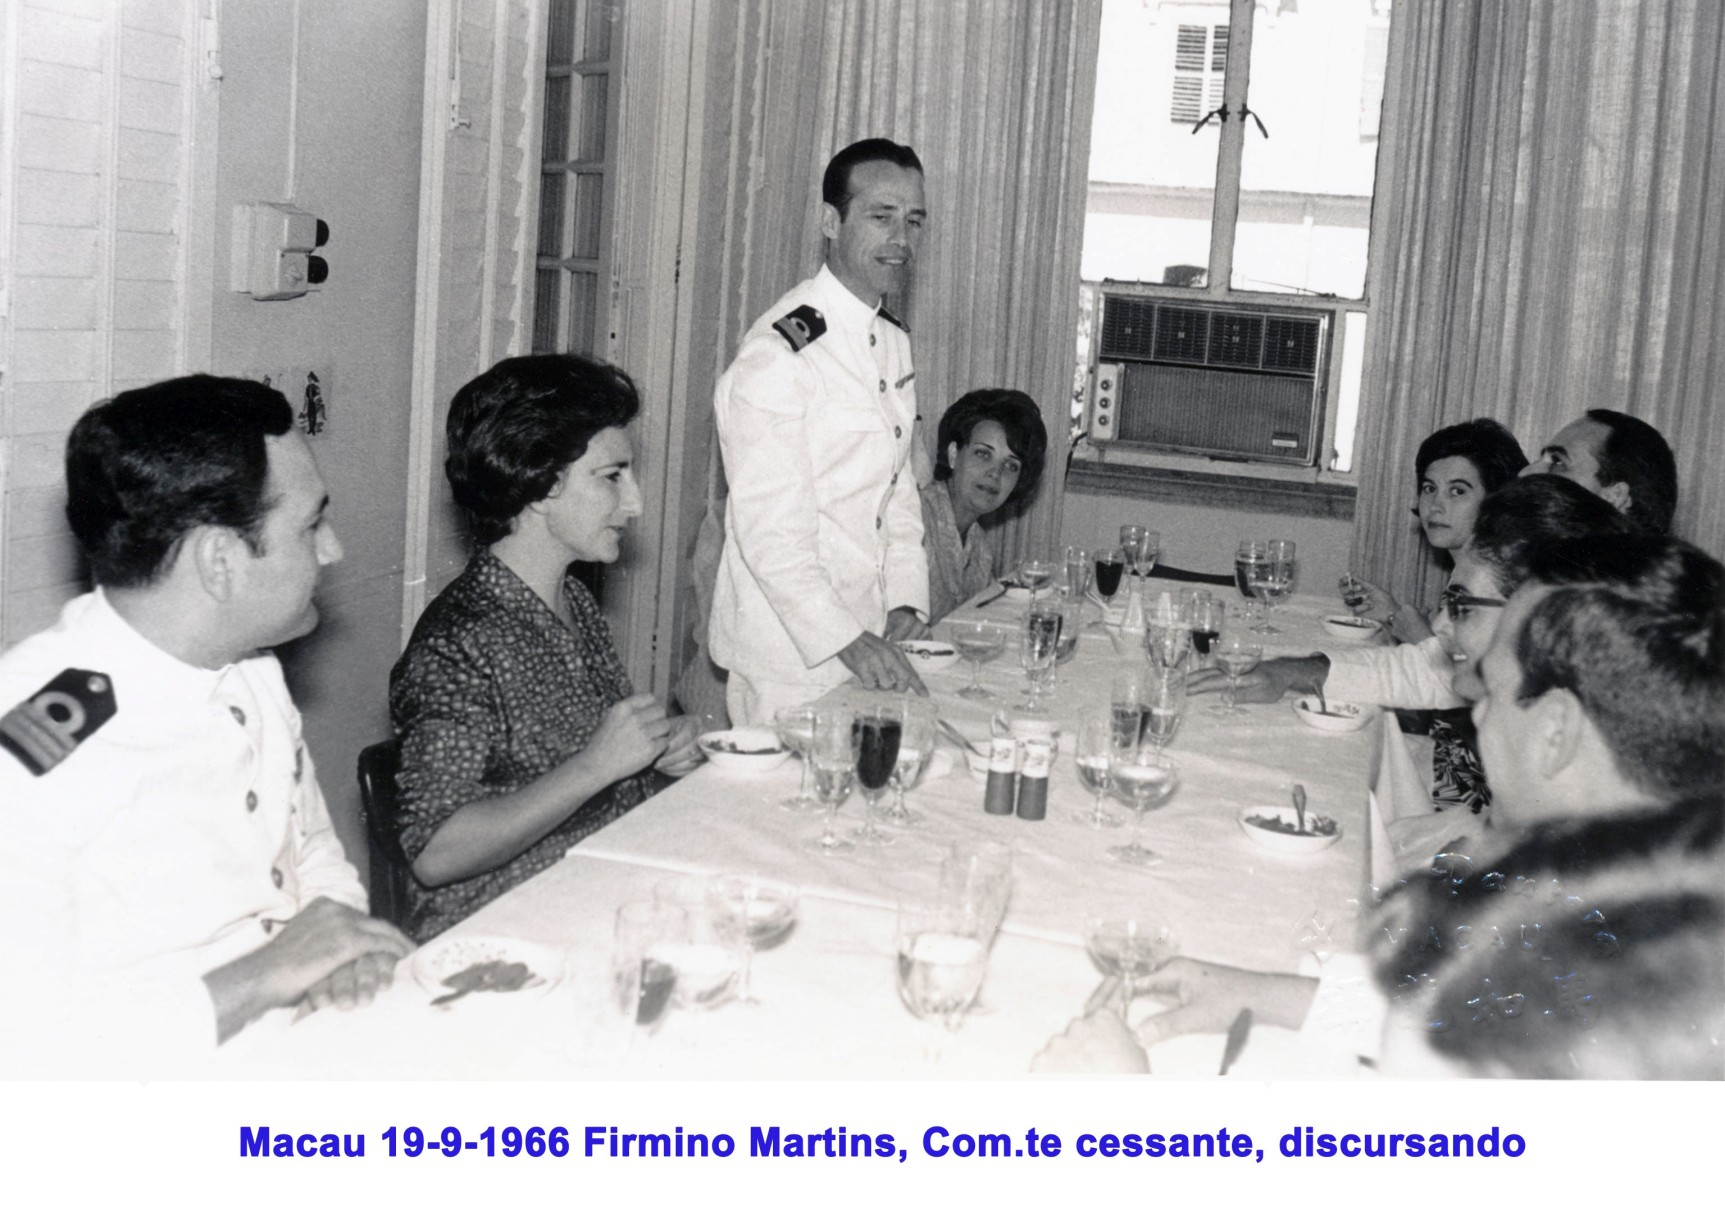 016 66-09-19 Firmino discursando